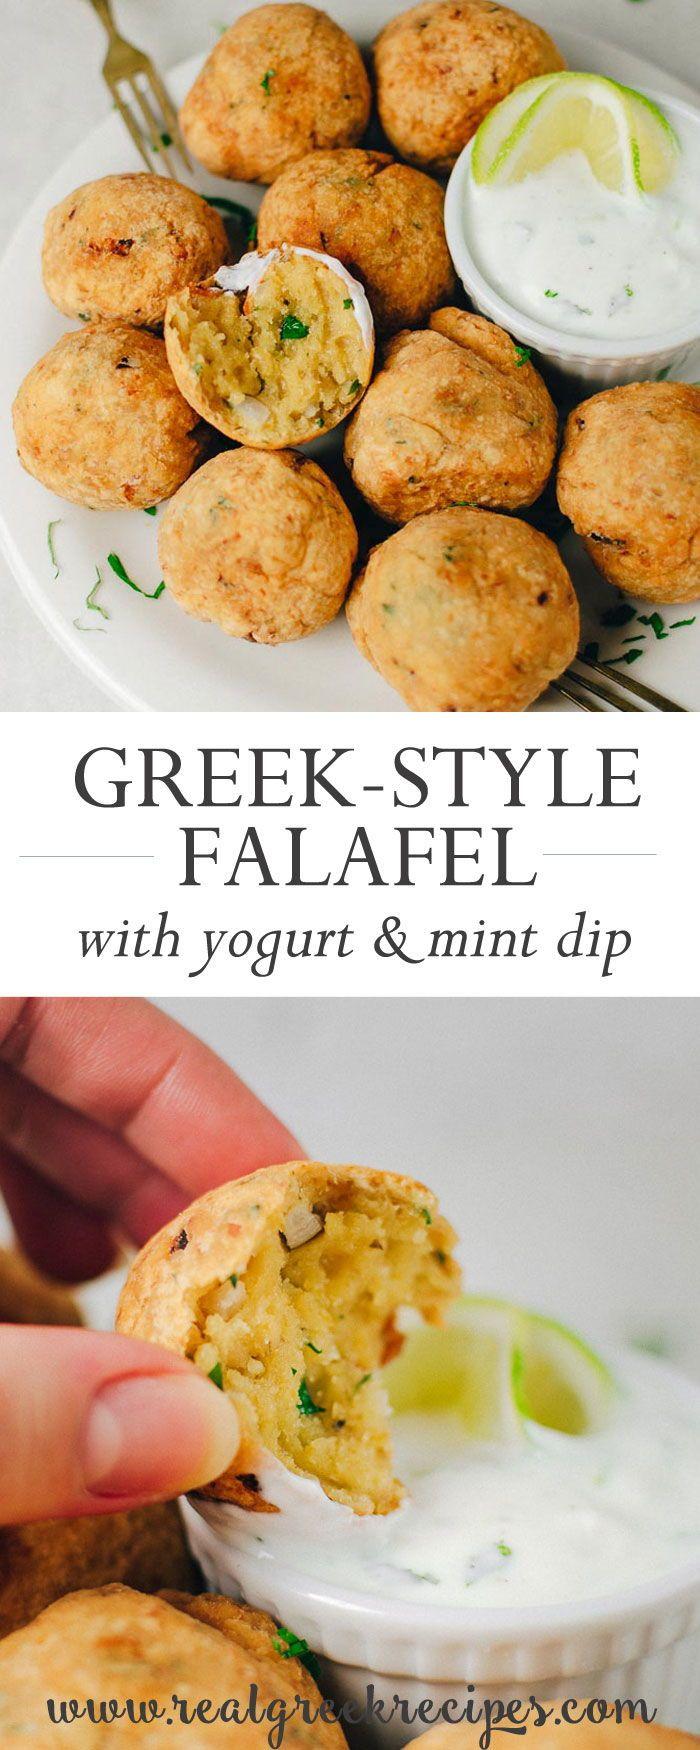 Chickpea Fritters Greek Style Falafel With Yogurt Mint Dip Real Greek Recipes Recipe Greek Recipes Chickpea Fritters Greek Dishes